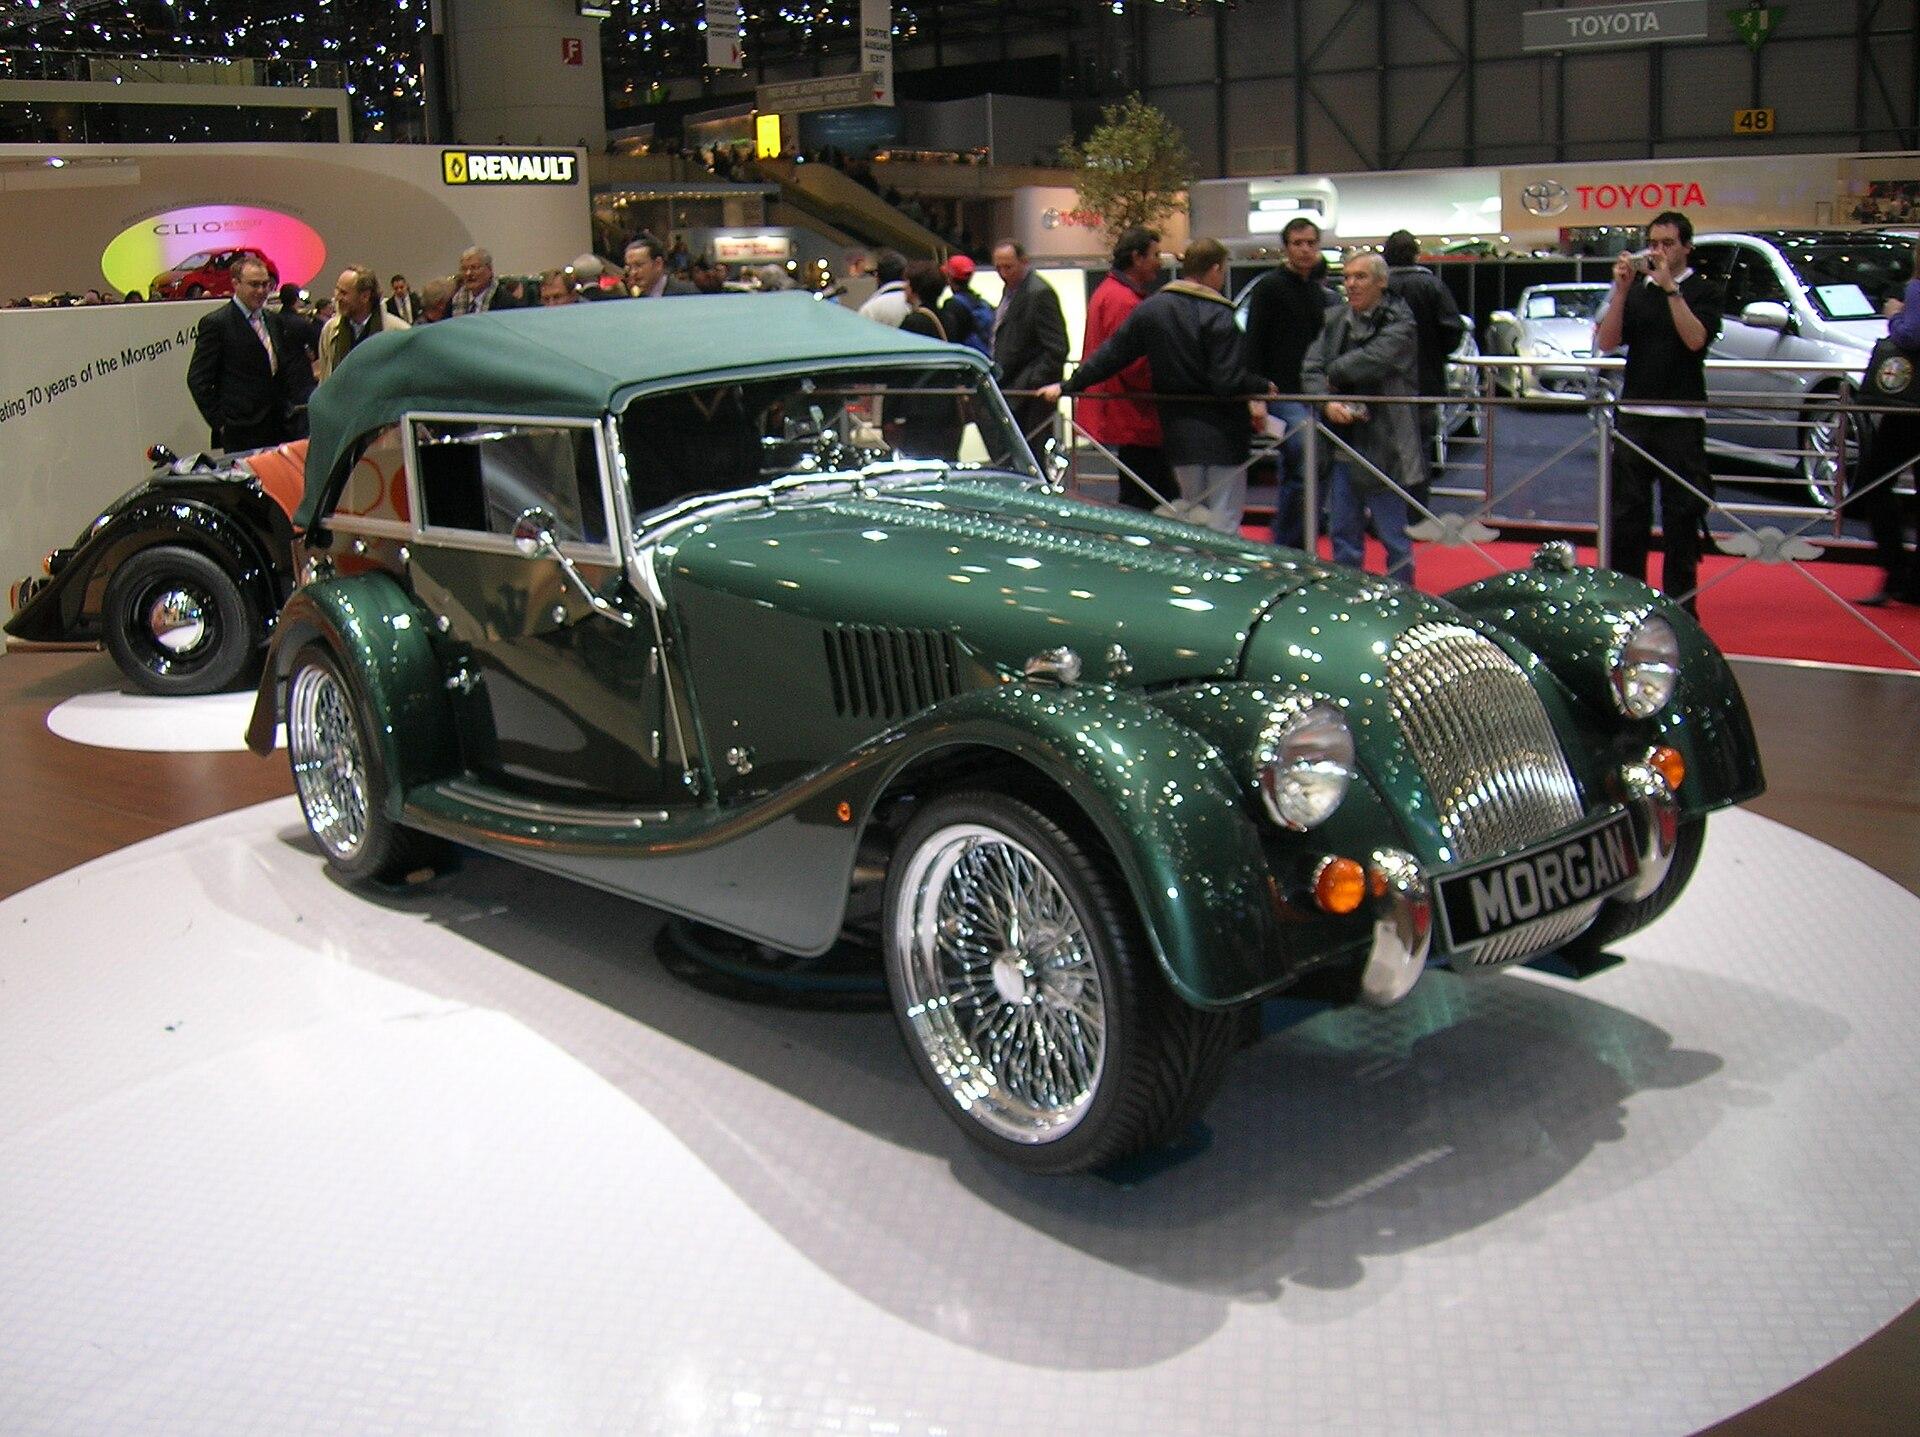 Morgan Roadster - Wikipedia